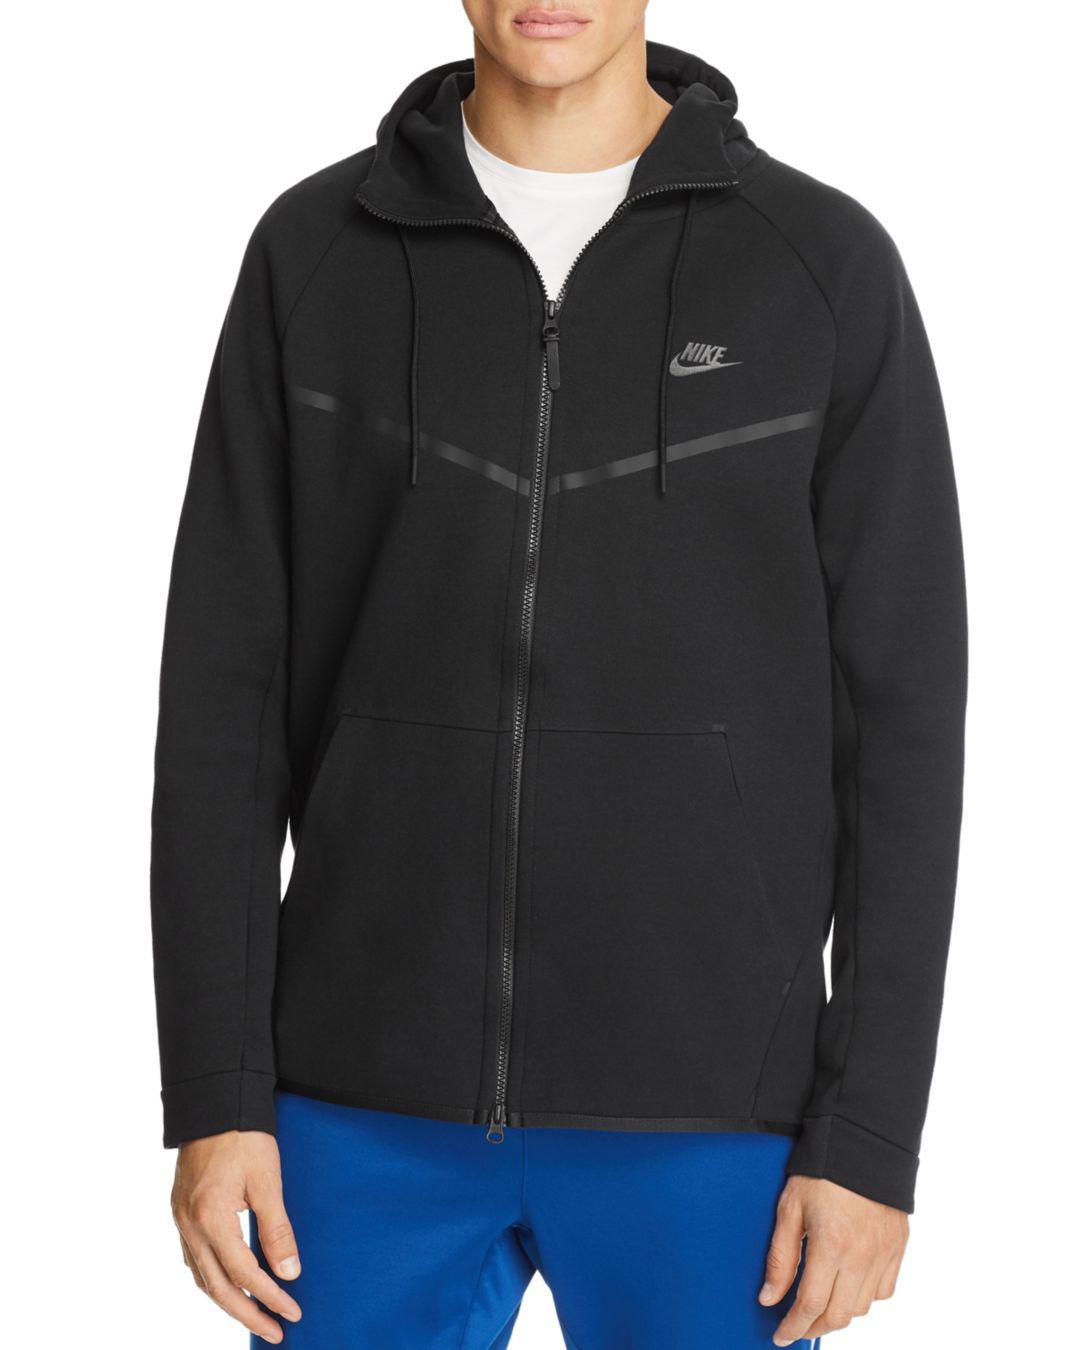 39c0385169 Lyst - Nike Tech Fleece Windrunner Hoodie Sweatshirt in Black for Men